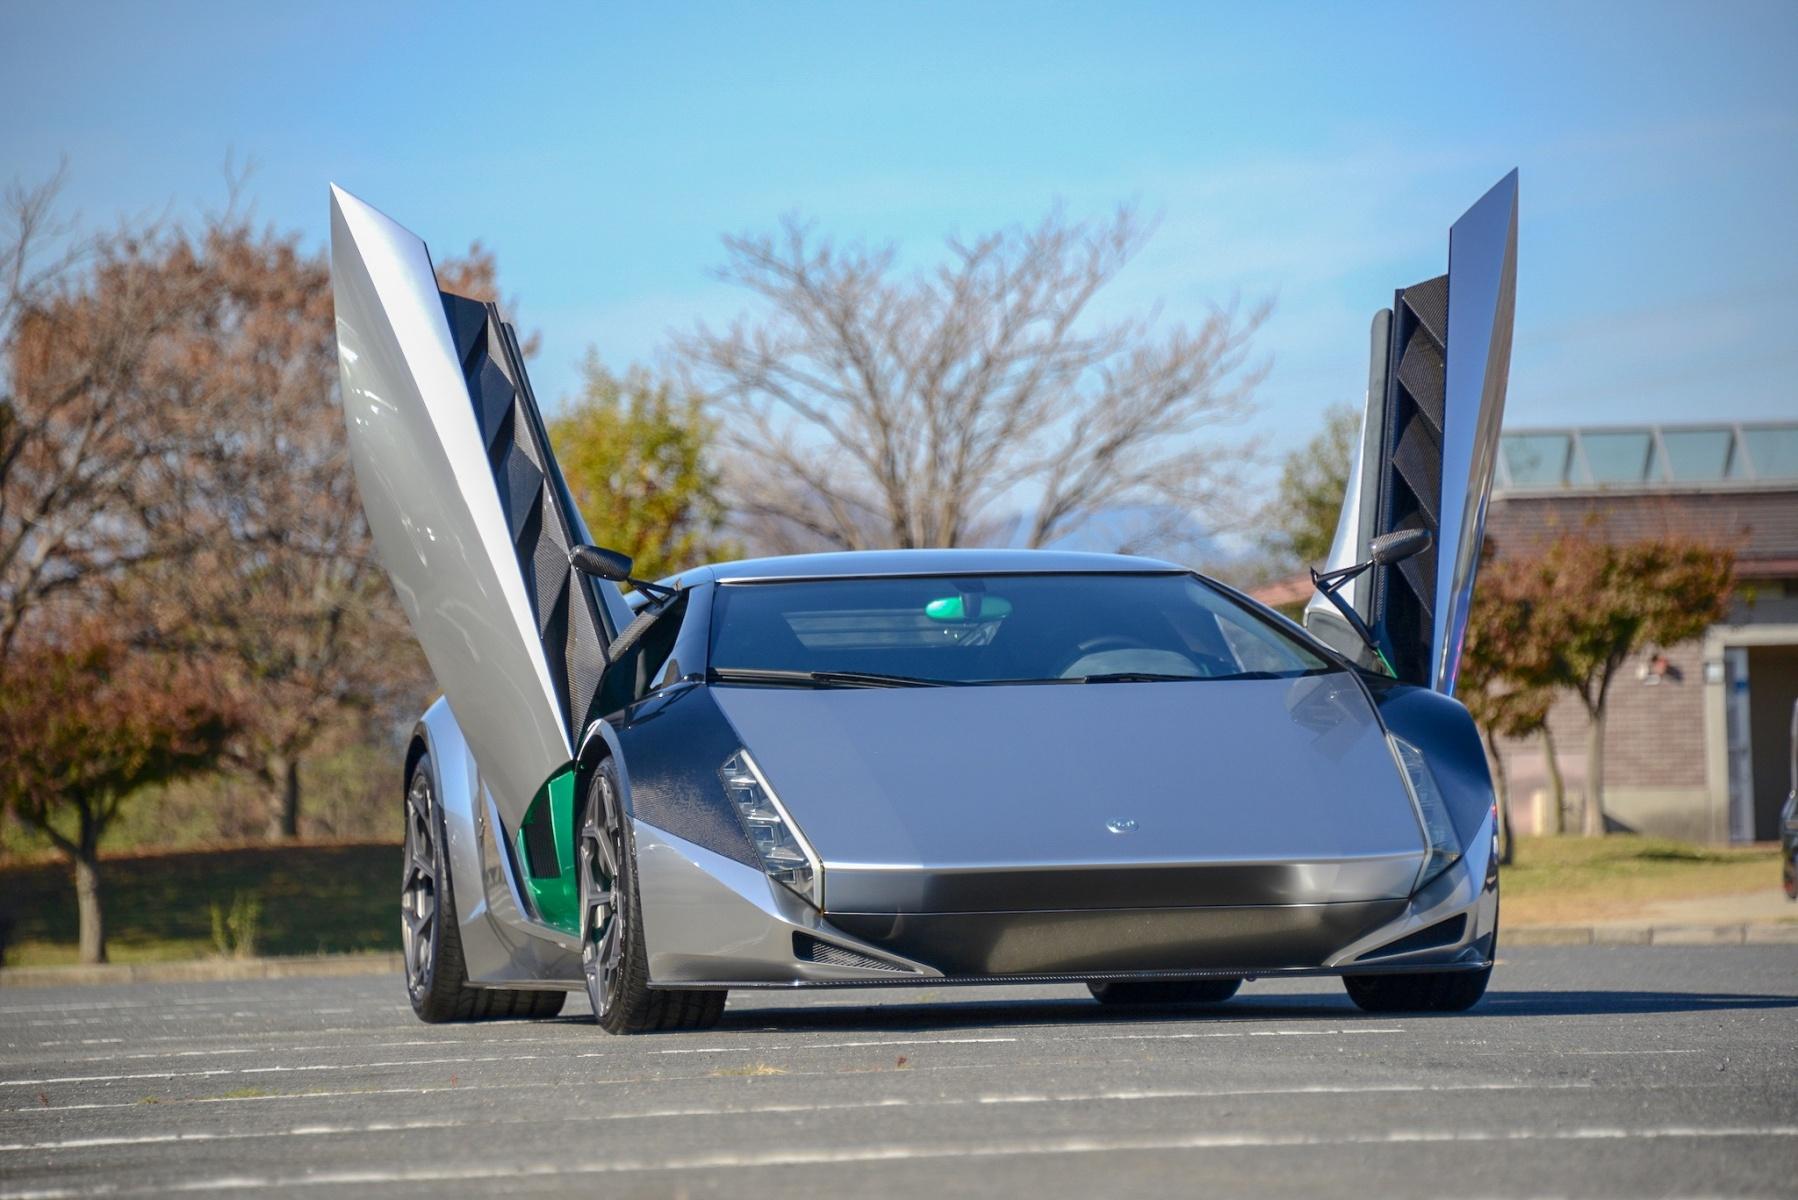 Kode 0 Supercar Based On Lamborghini Aventador For Sale Gtspirit